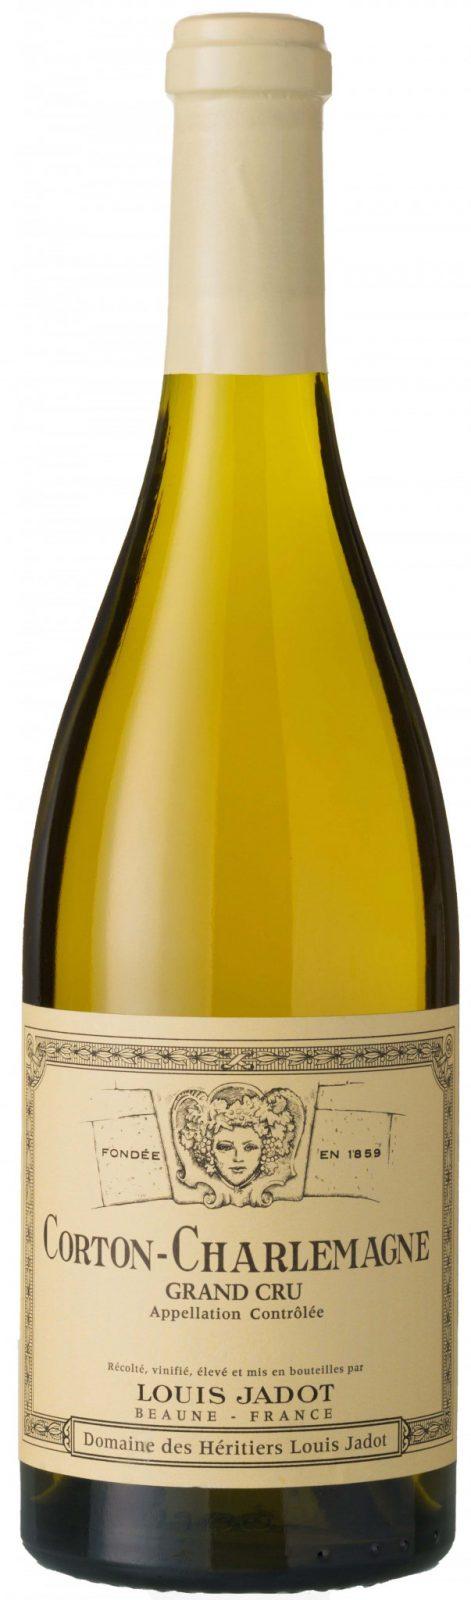 Louis Jadot Corton Charlemagne Grand Cru Wineaffair